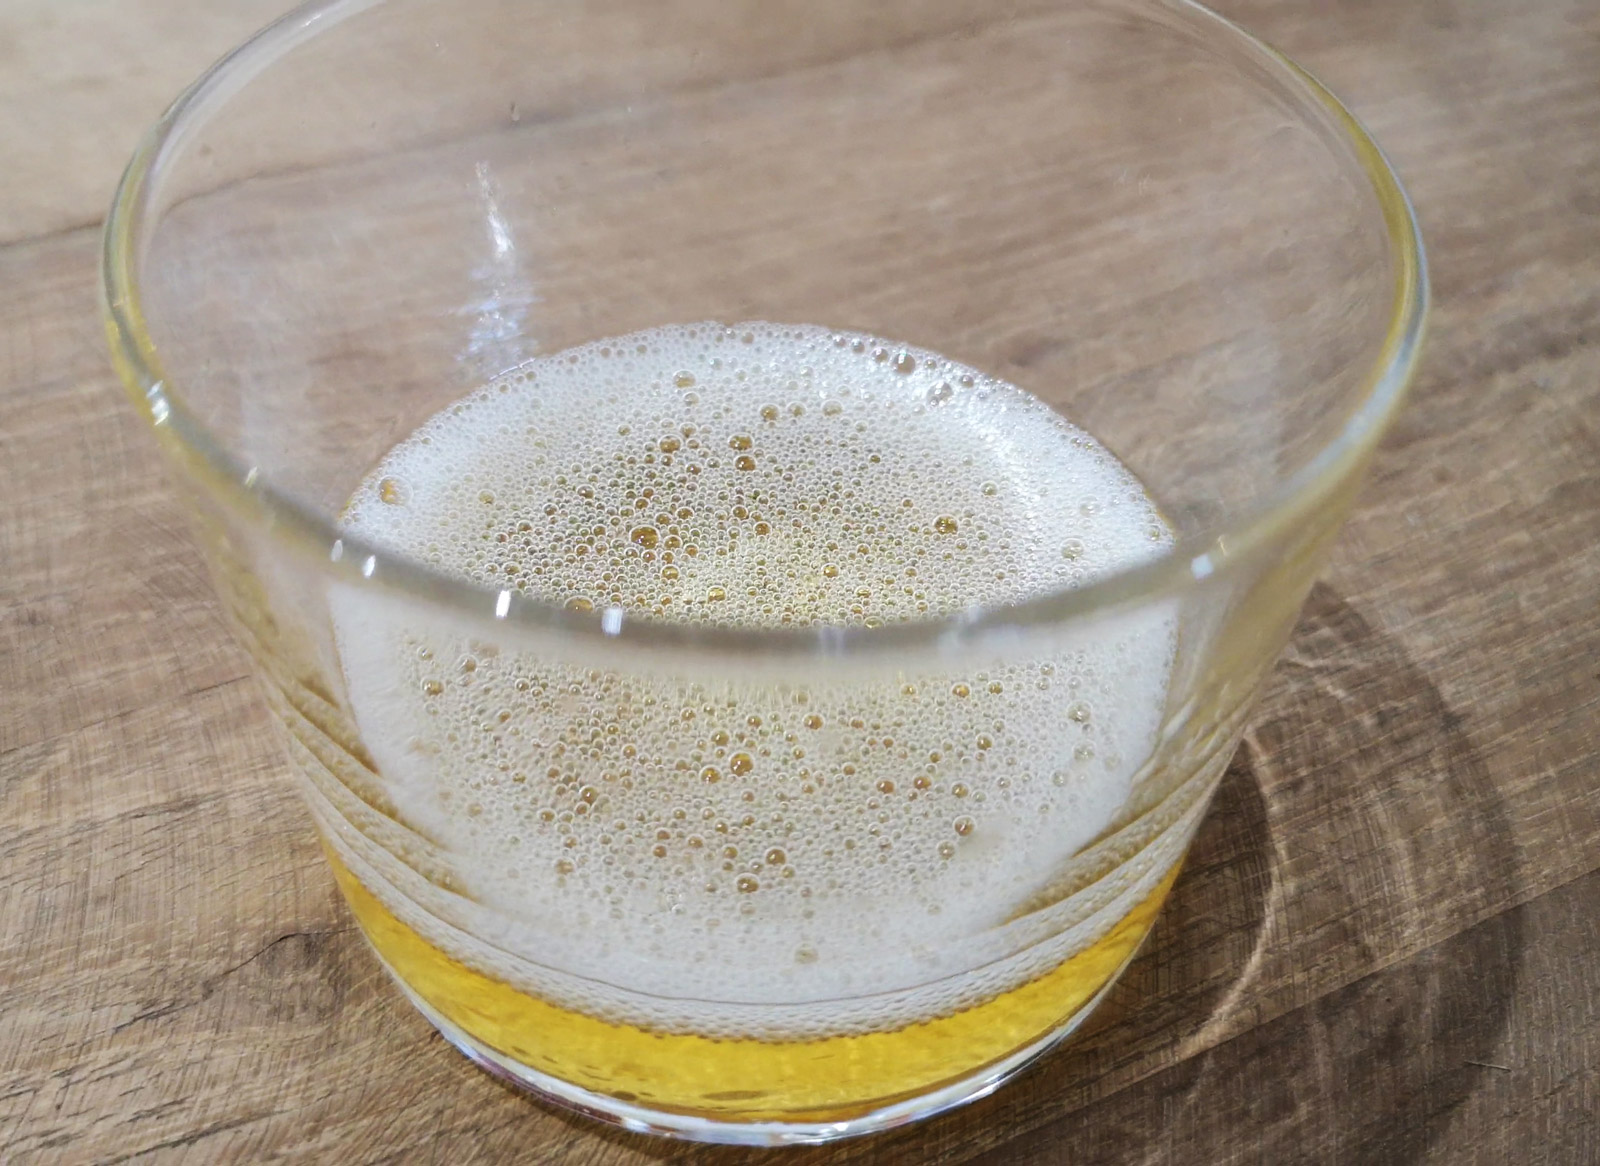 Eztigar Cider